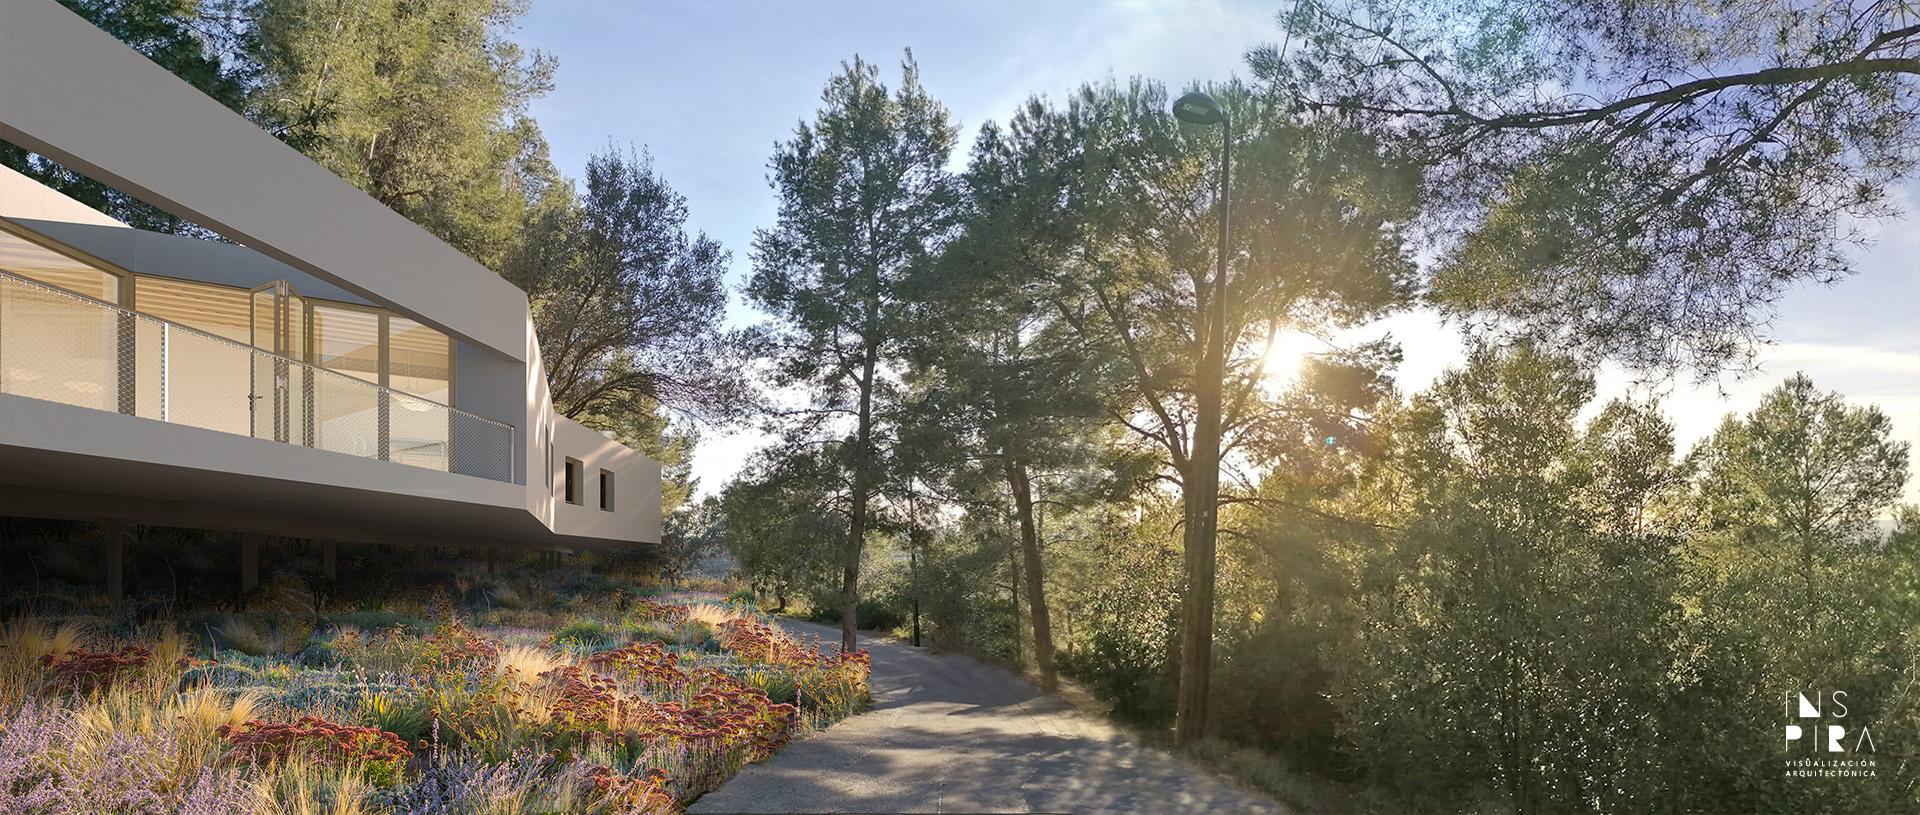 render-3d-arquitectura-exterior-casa-imagen-real